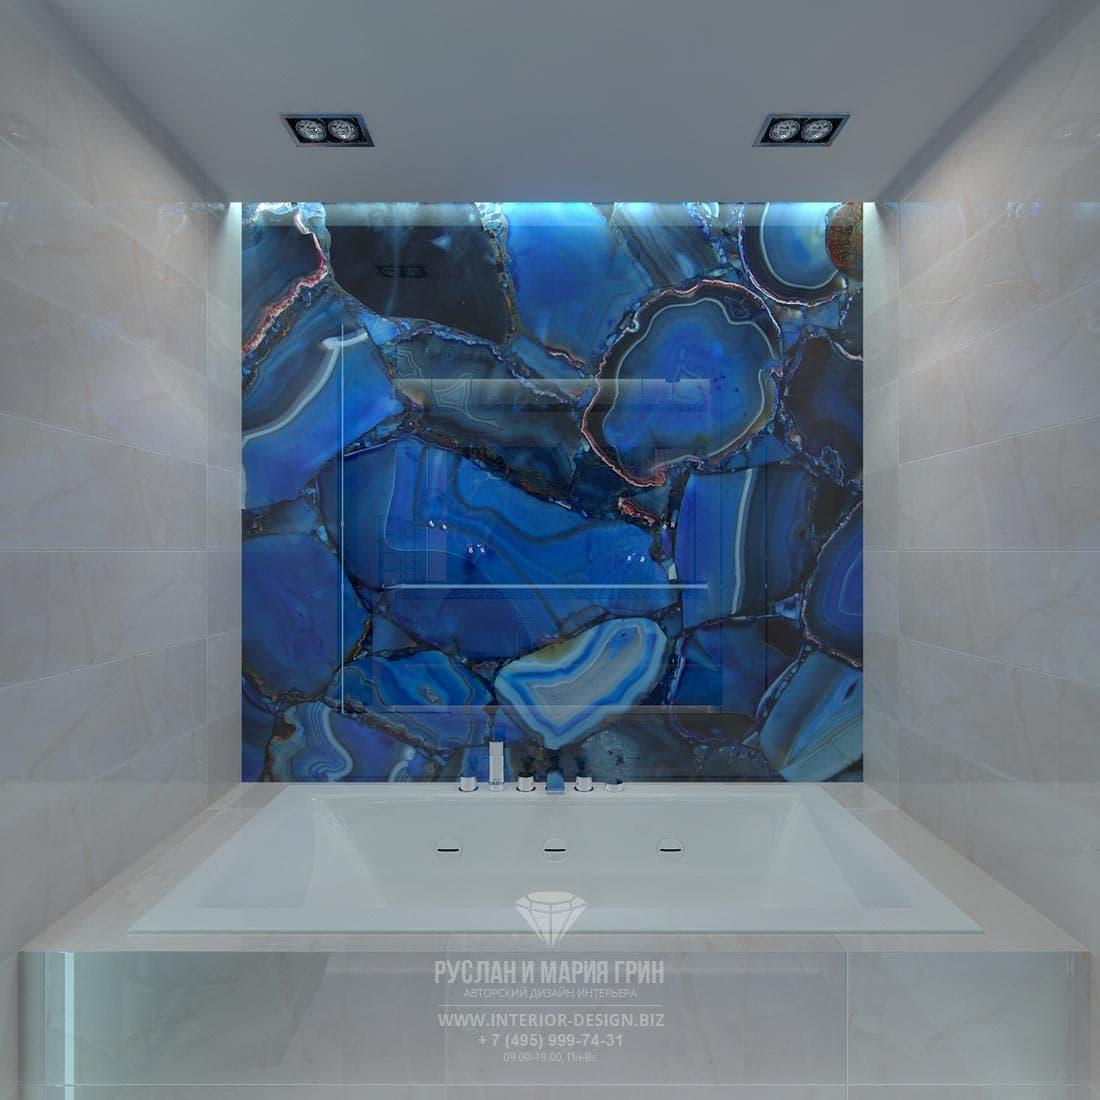 Ванная комната с синим акцентом